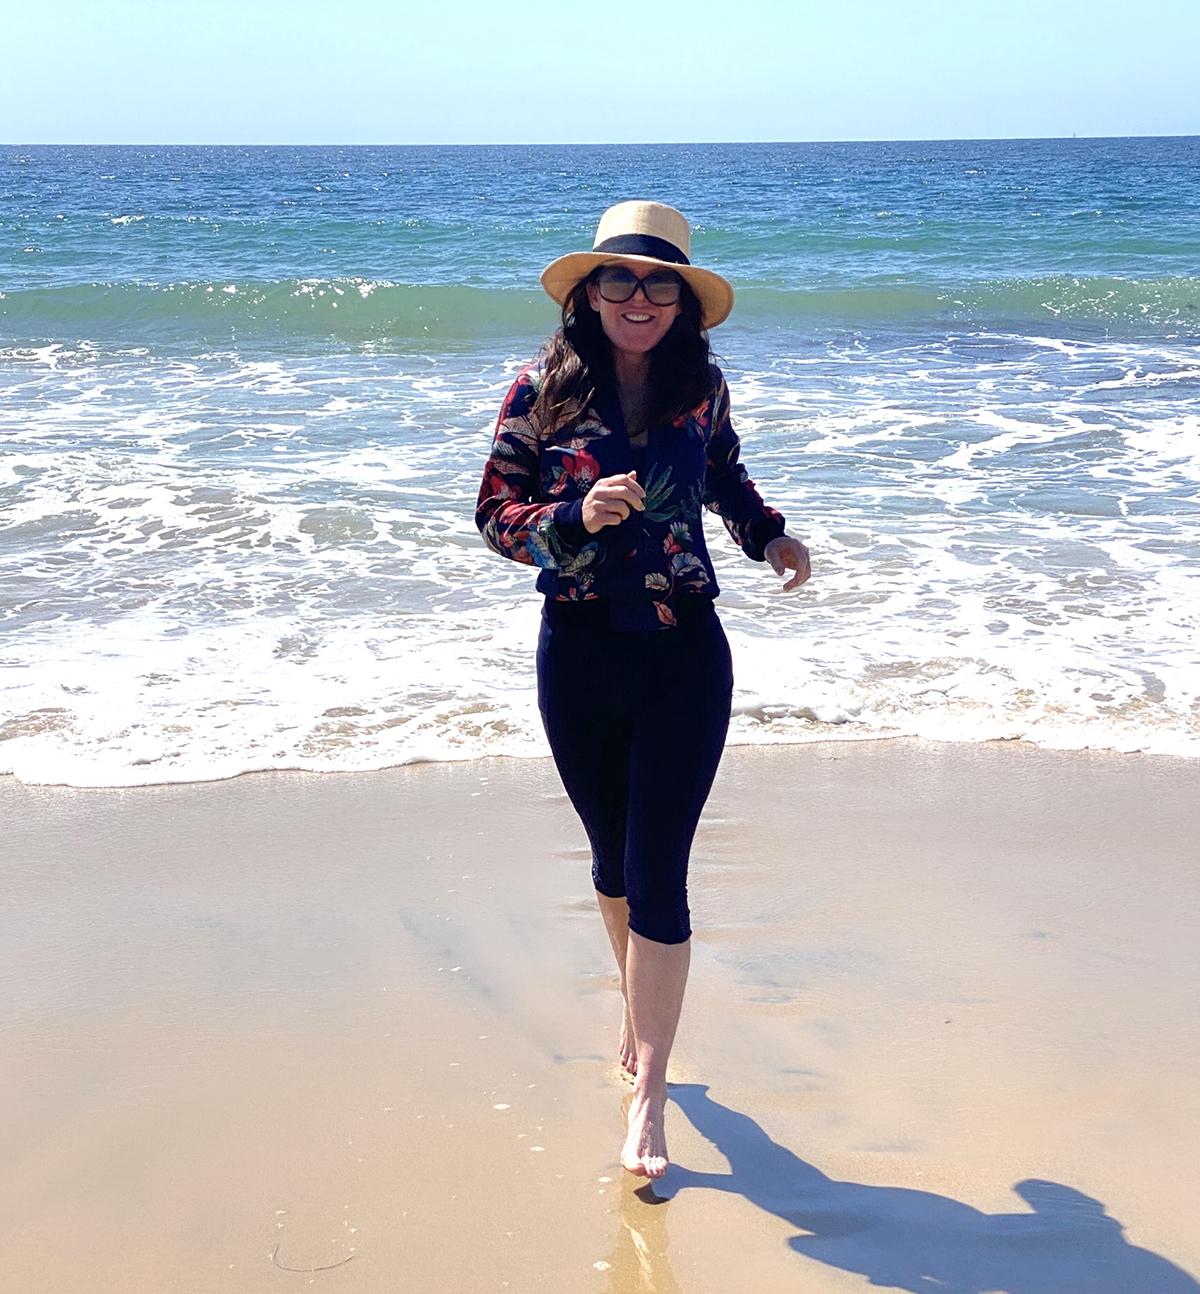 Jogging at Laguna Beach